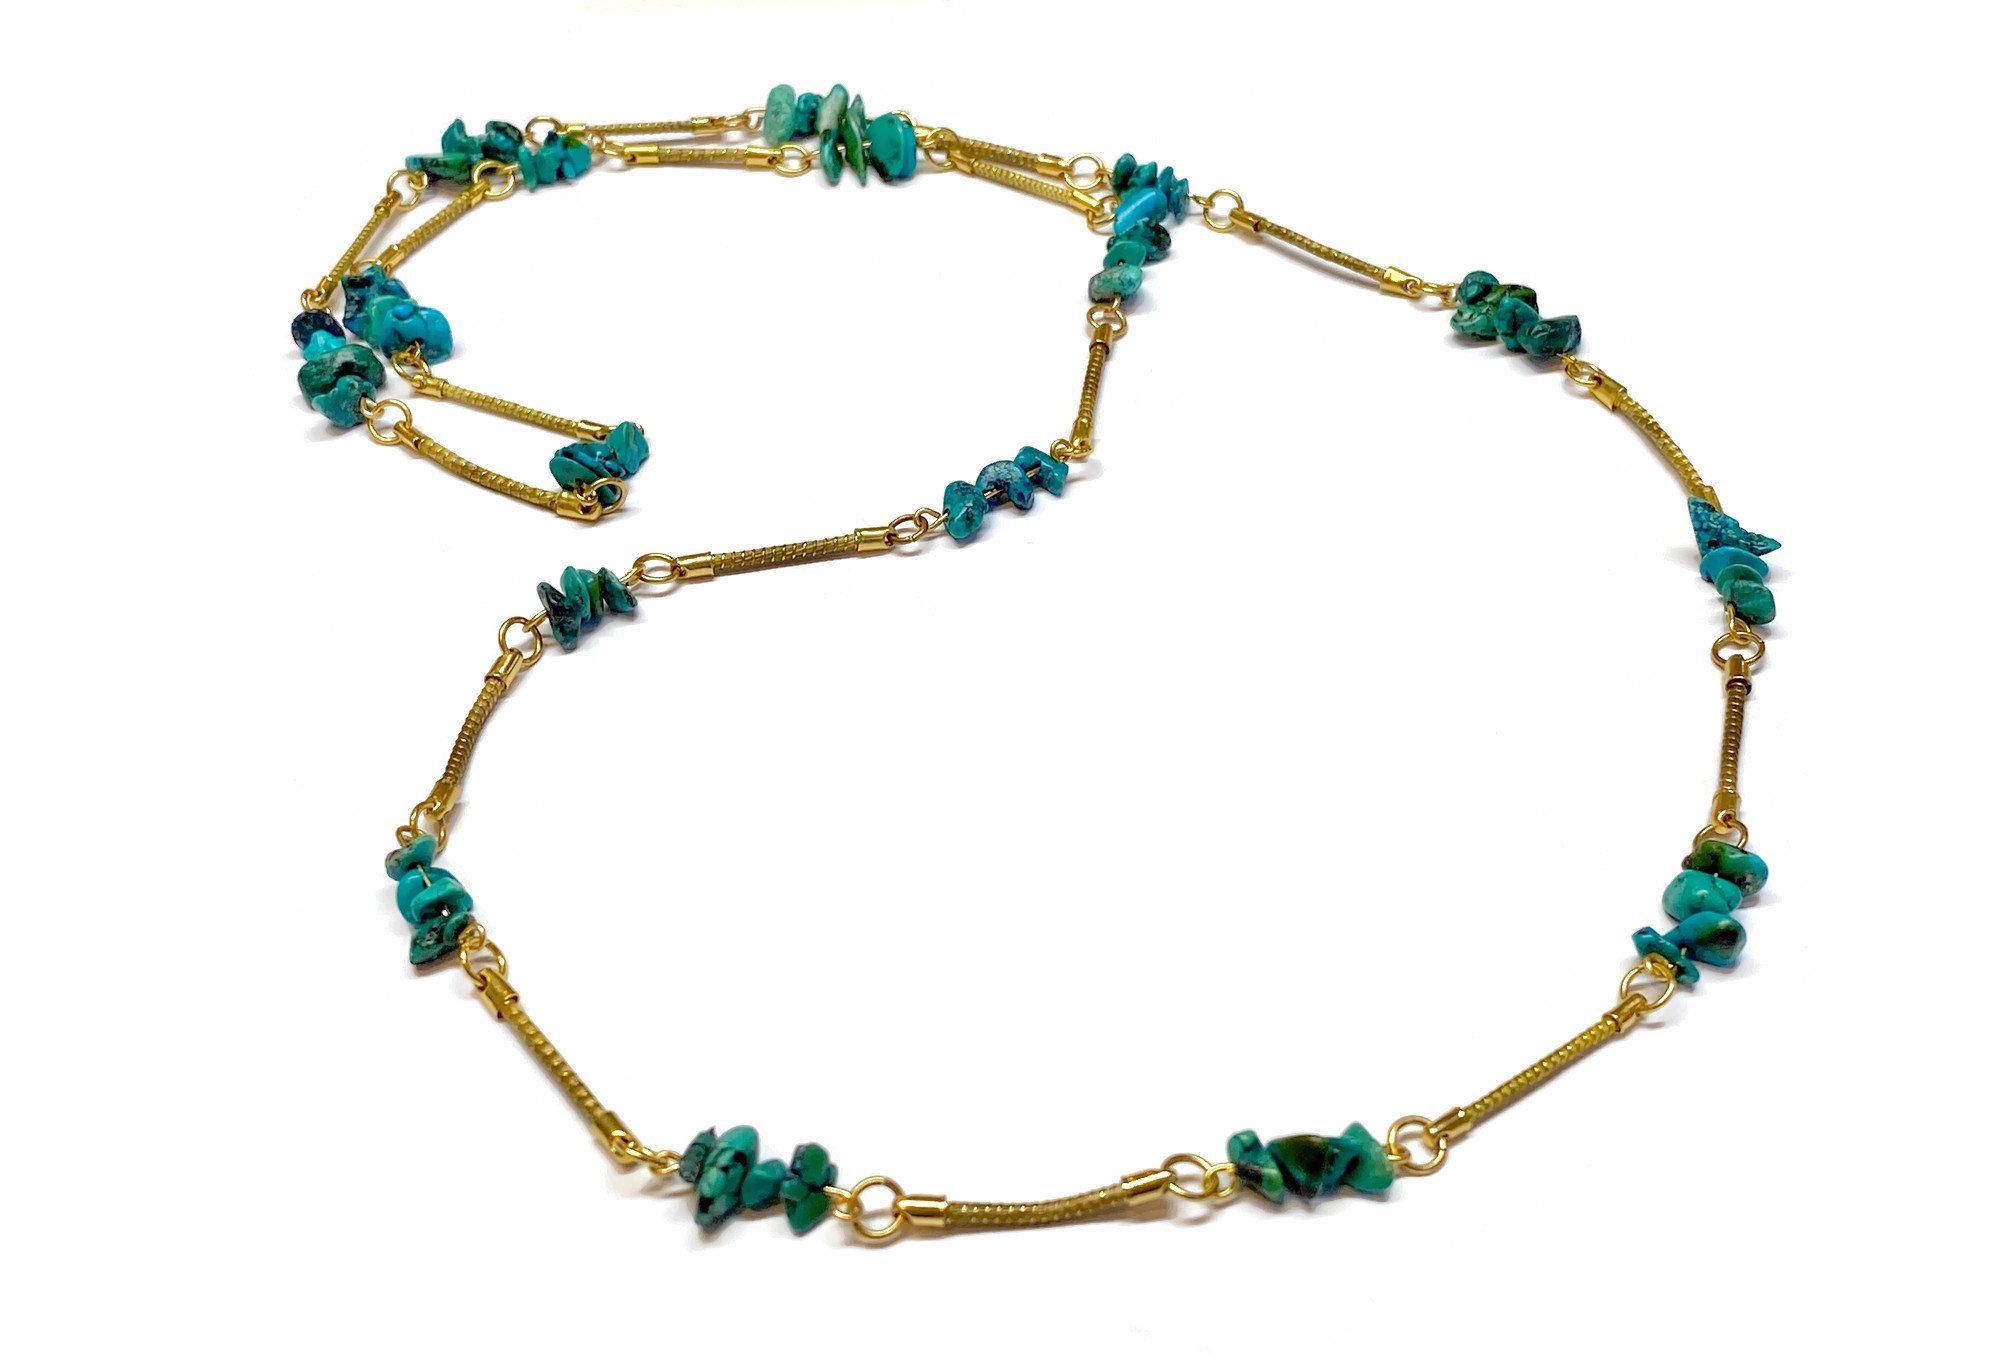 Photo of Lange Perlenkette, Casual Chick Halskette, Golden Grass, Türkis Halskette, Bio Halskette, Boho Halskette